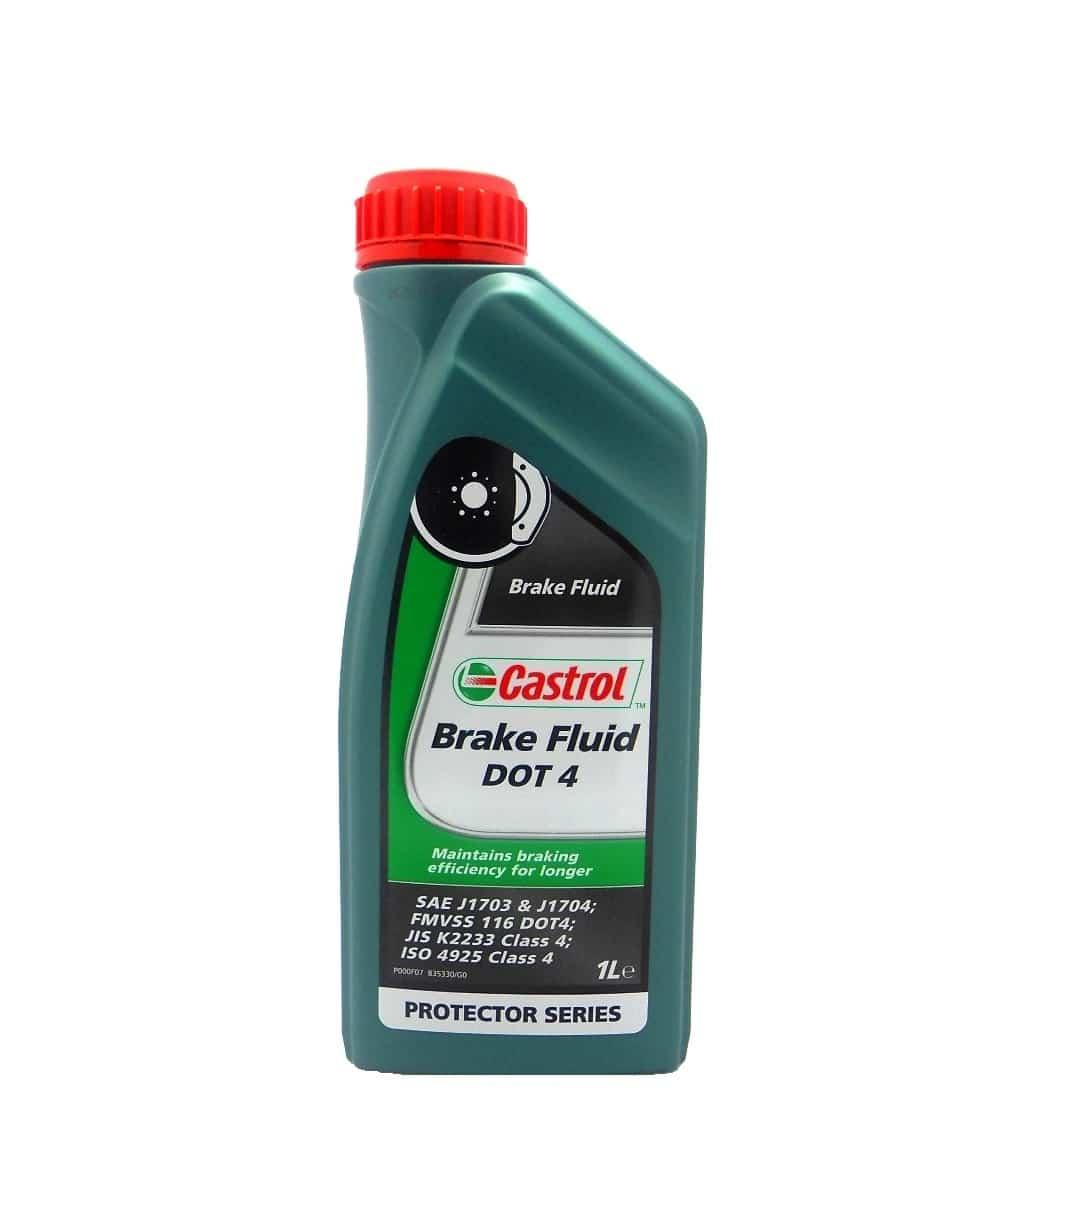 Castrol Brake Fluid Dot 4